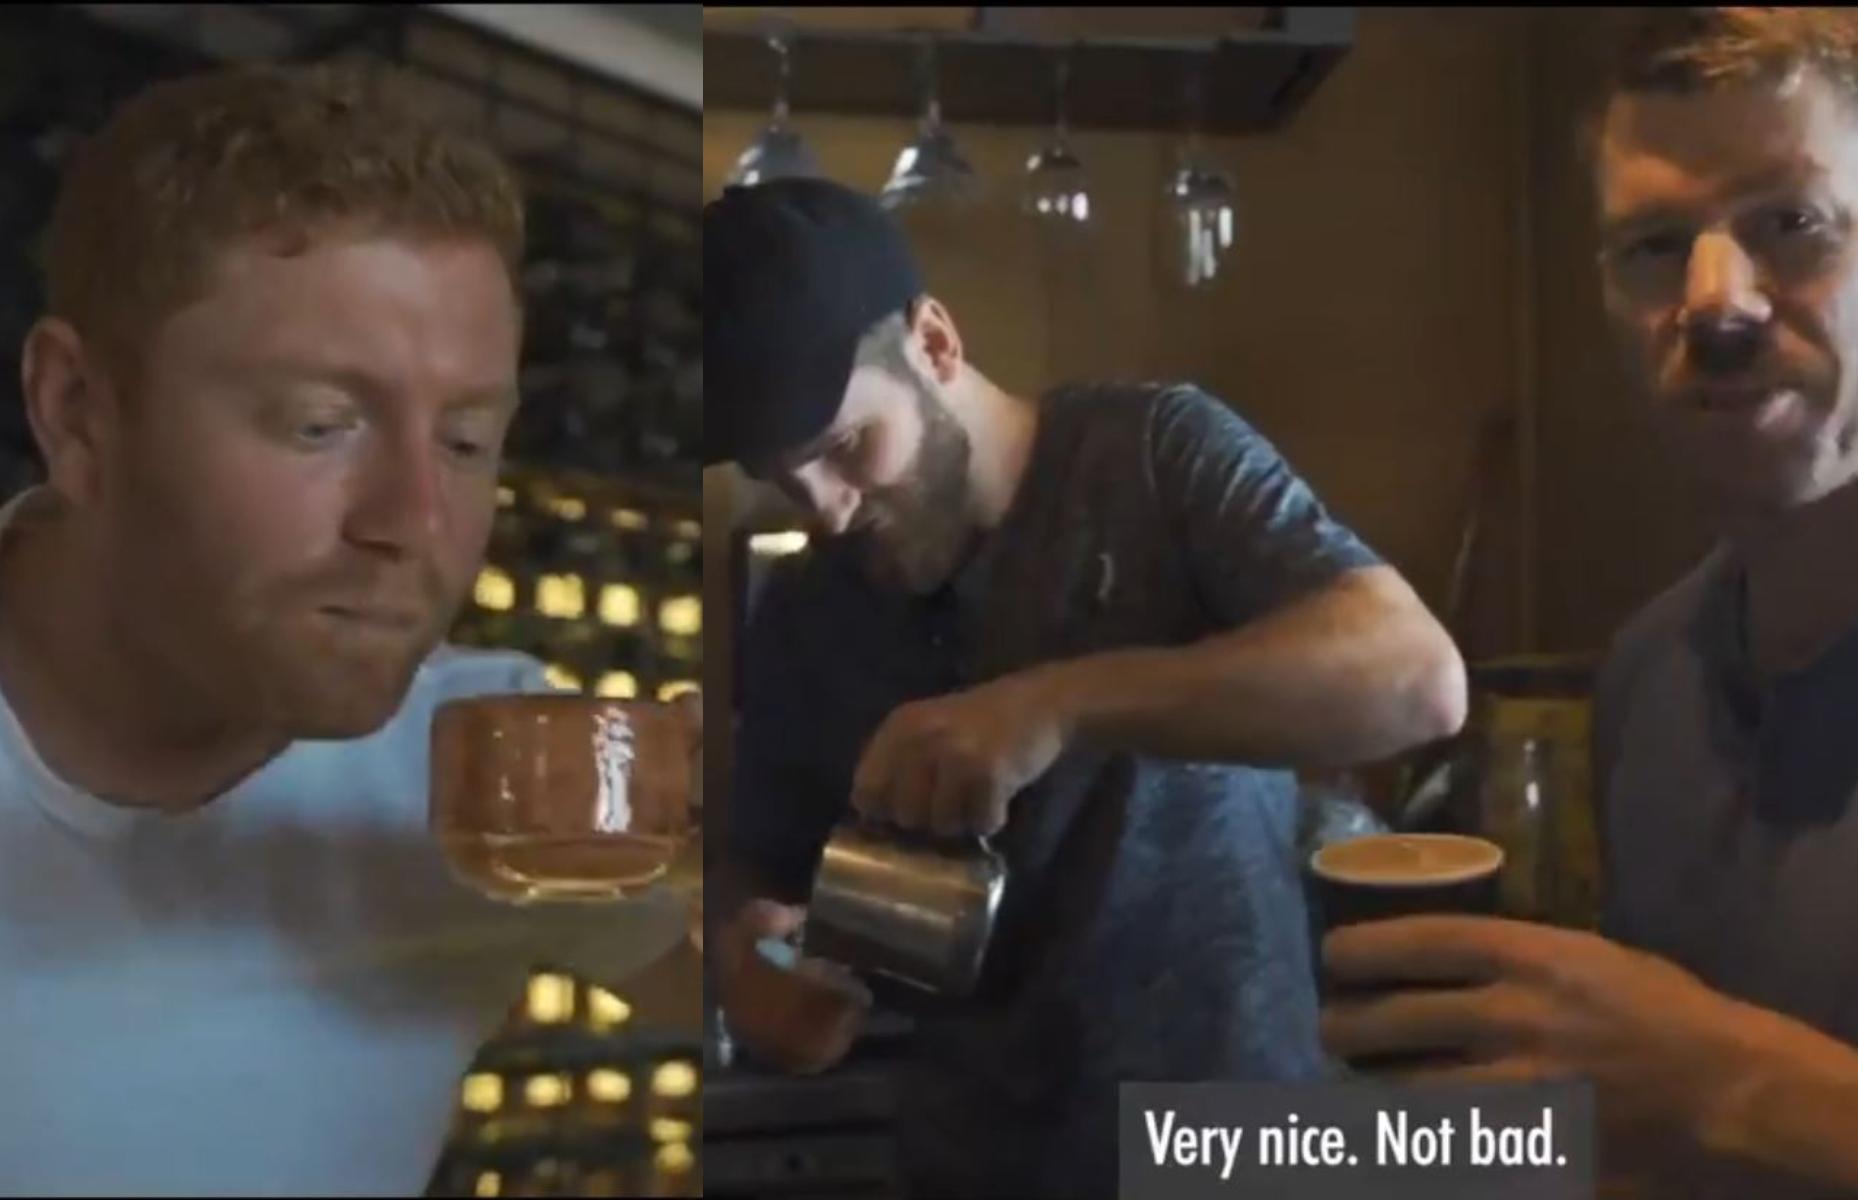 Bairstow and Warner taste Williamson-made coffee | SRH Twitter